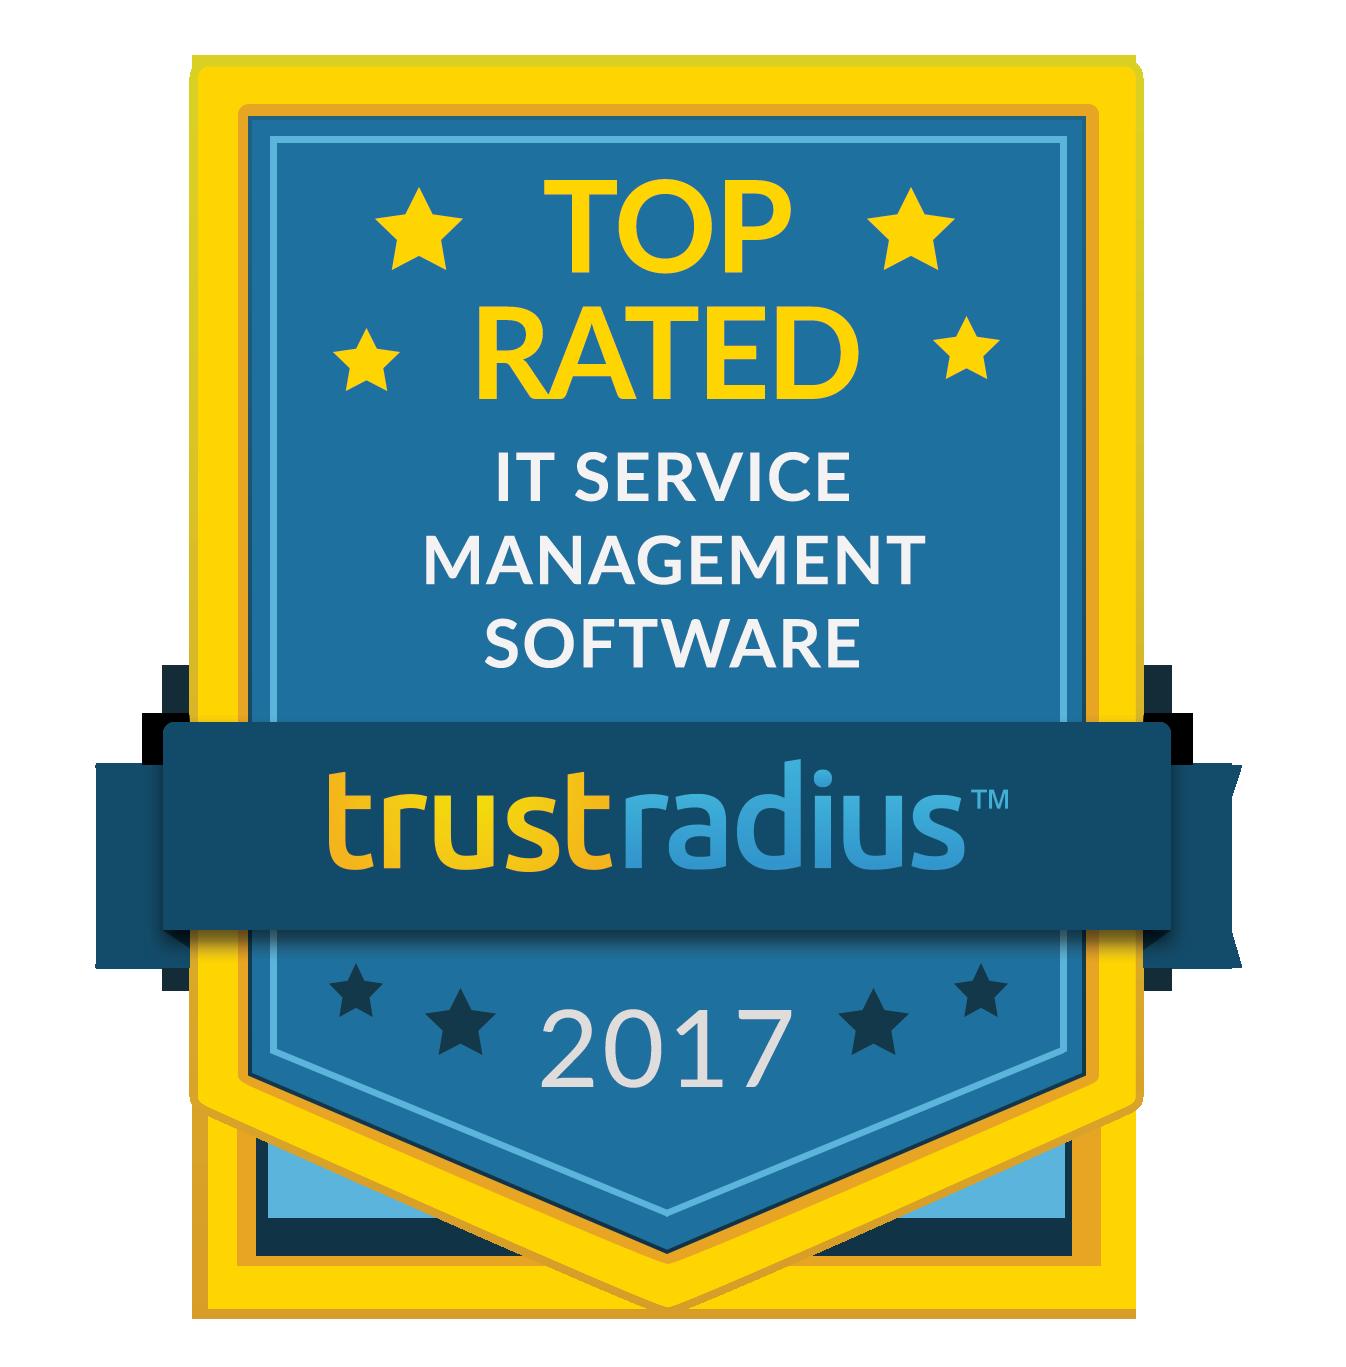 Trustradius 最受好评的 IT 服务管理软件图标